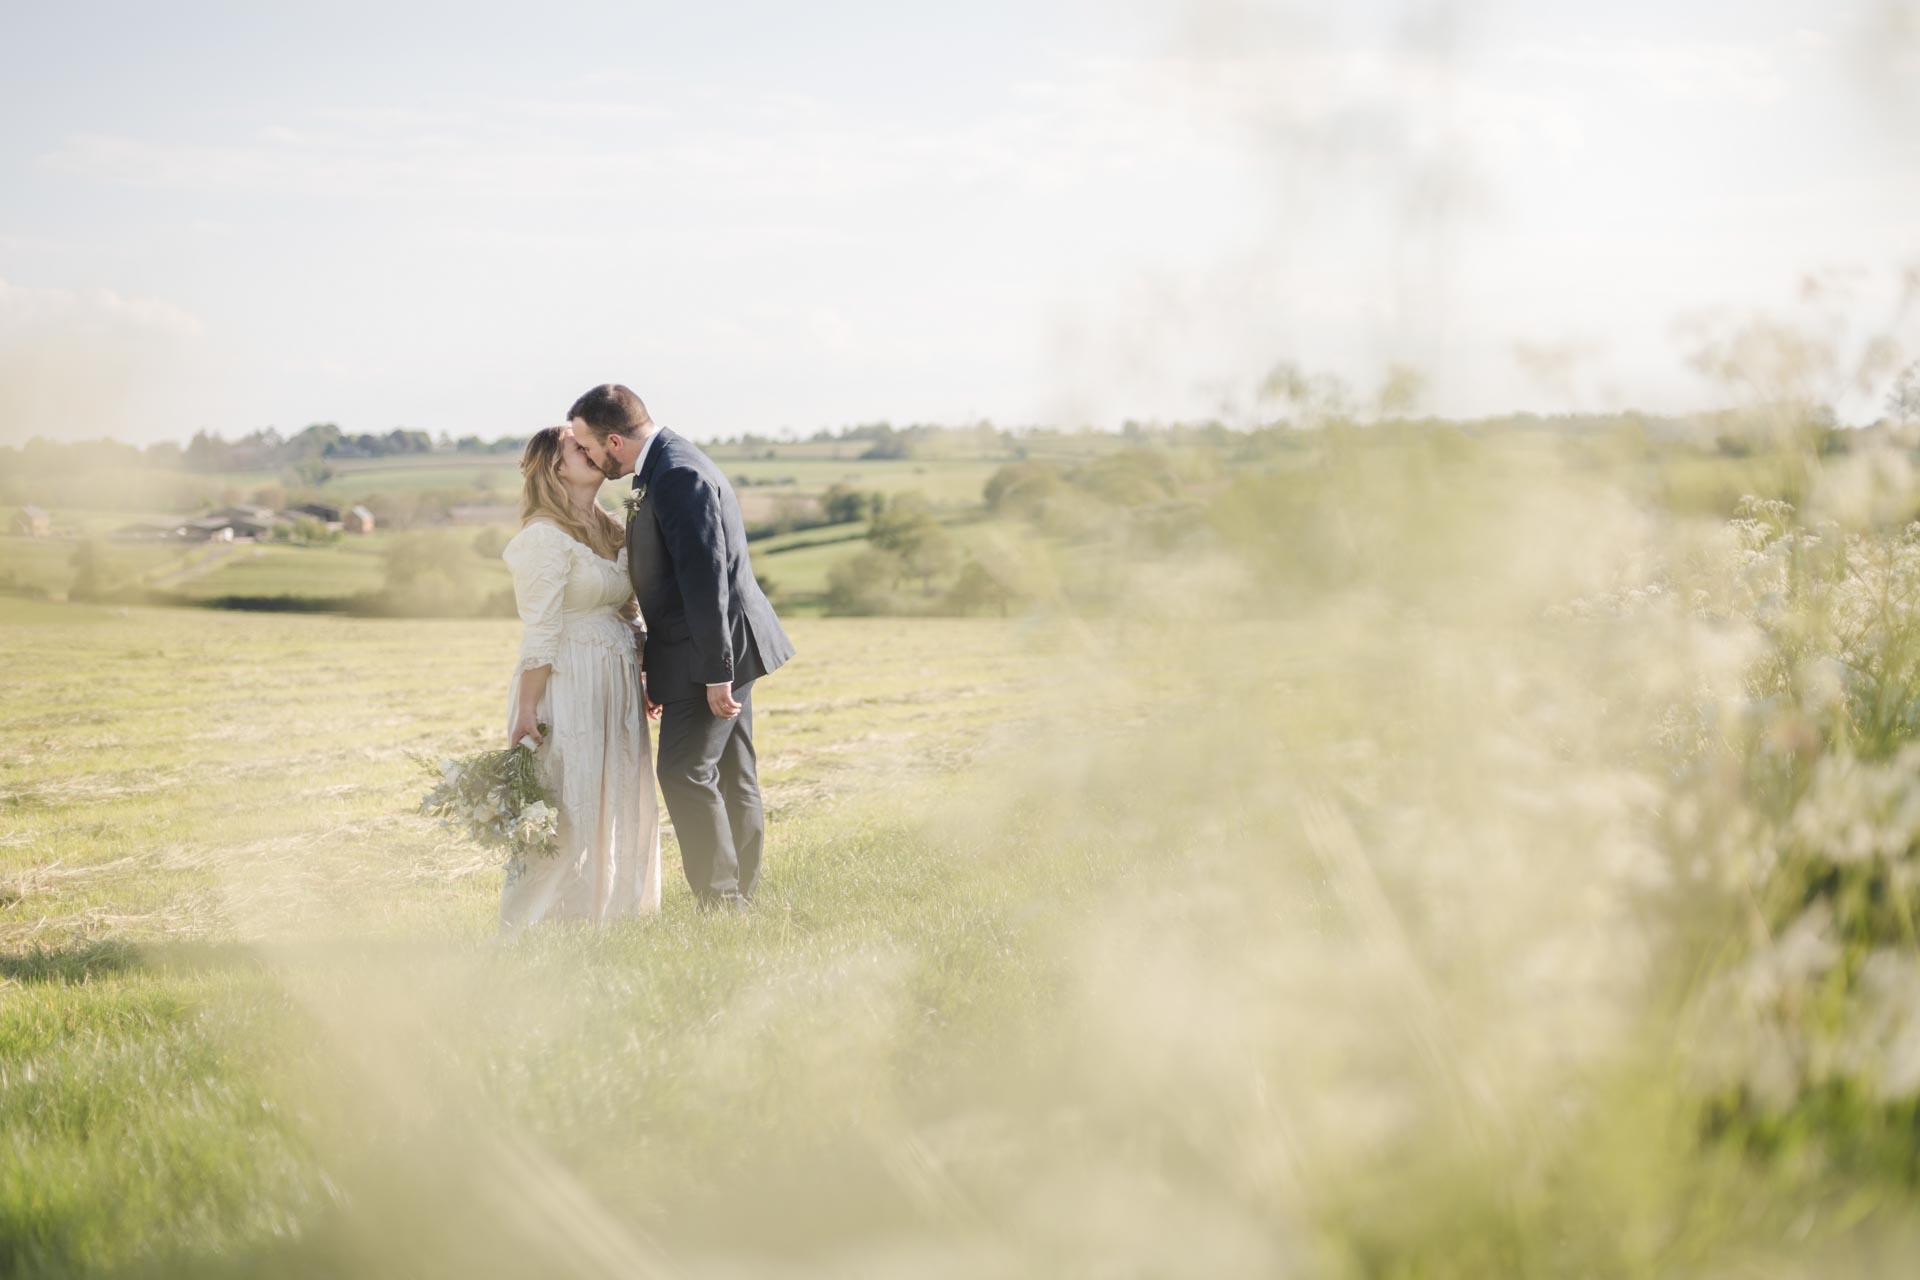 jezz and alicia wedding photographer london 292 of 359